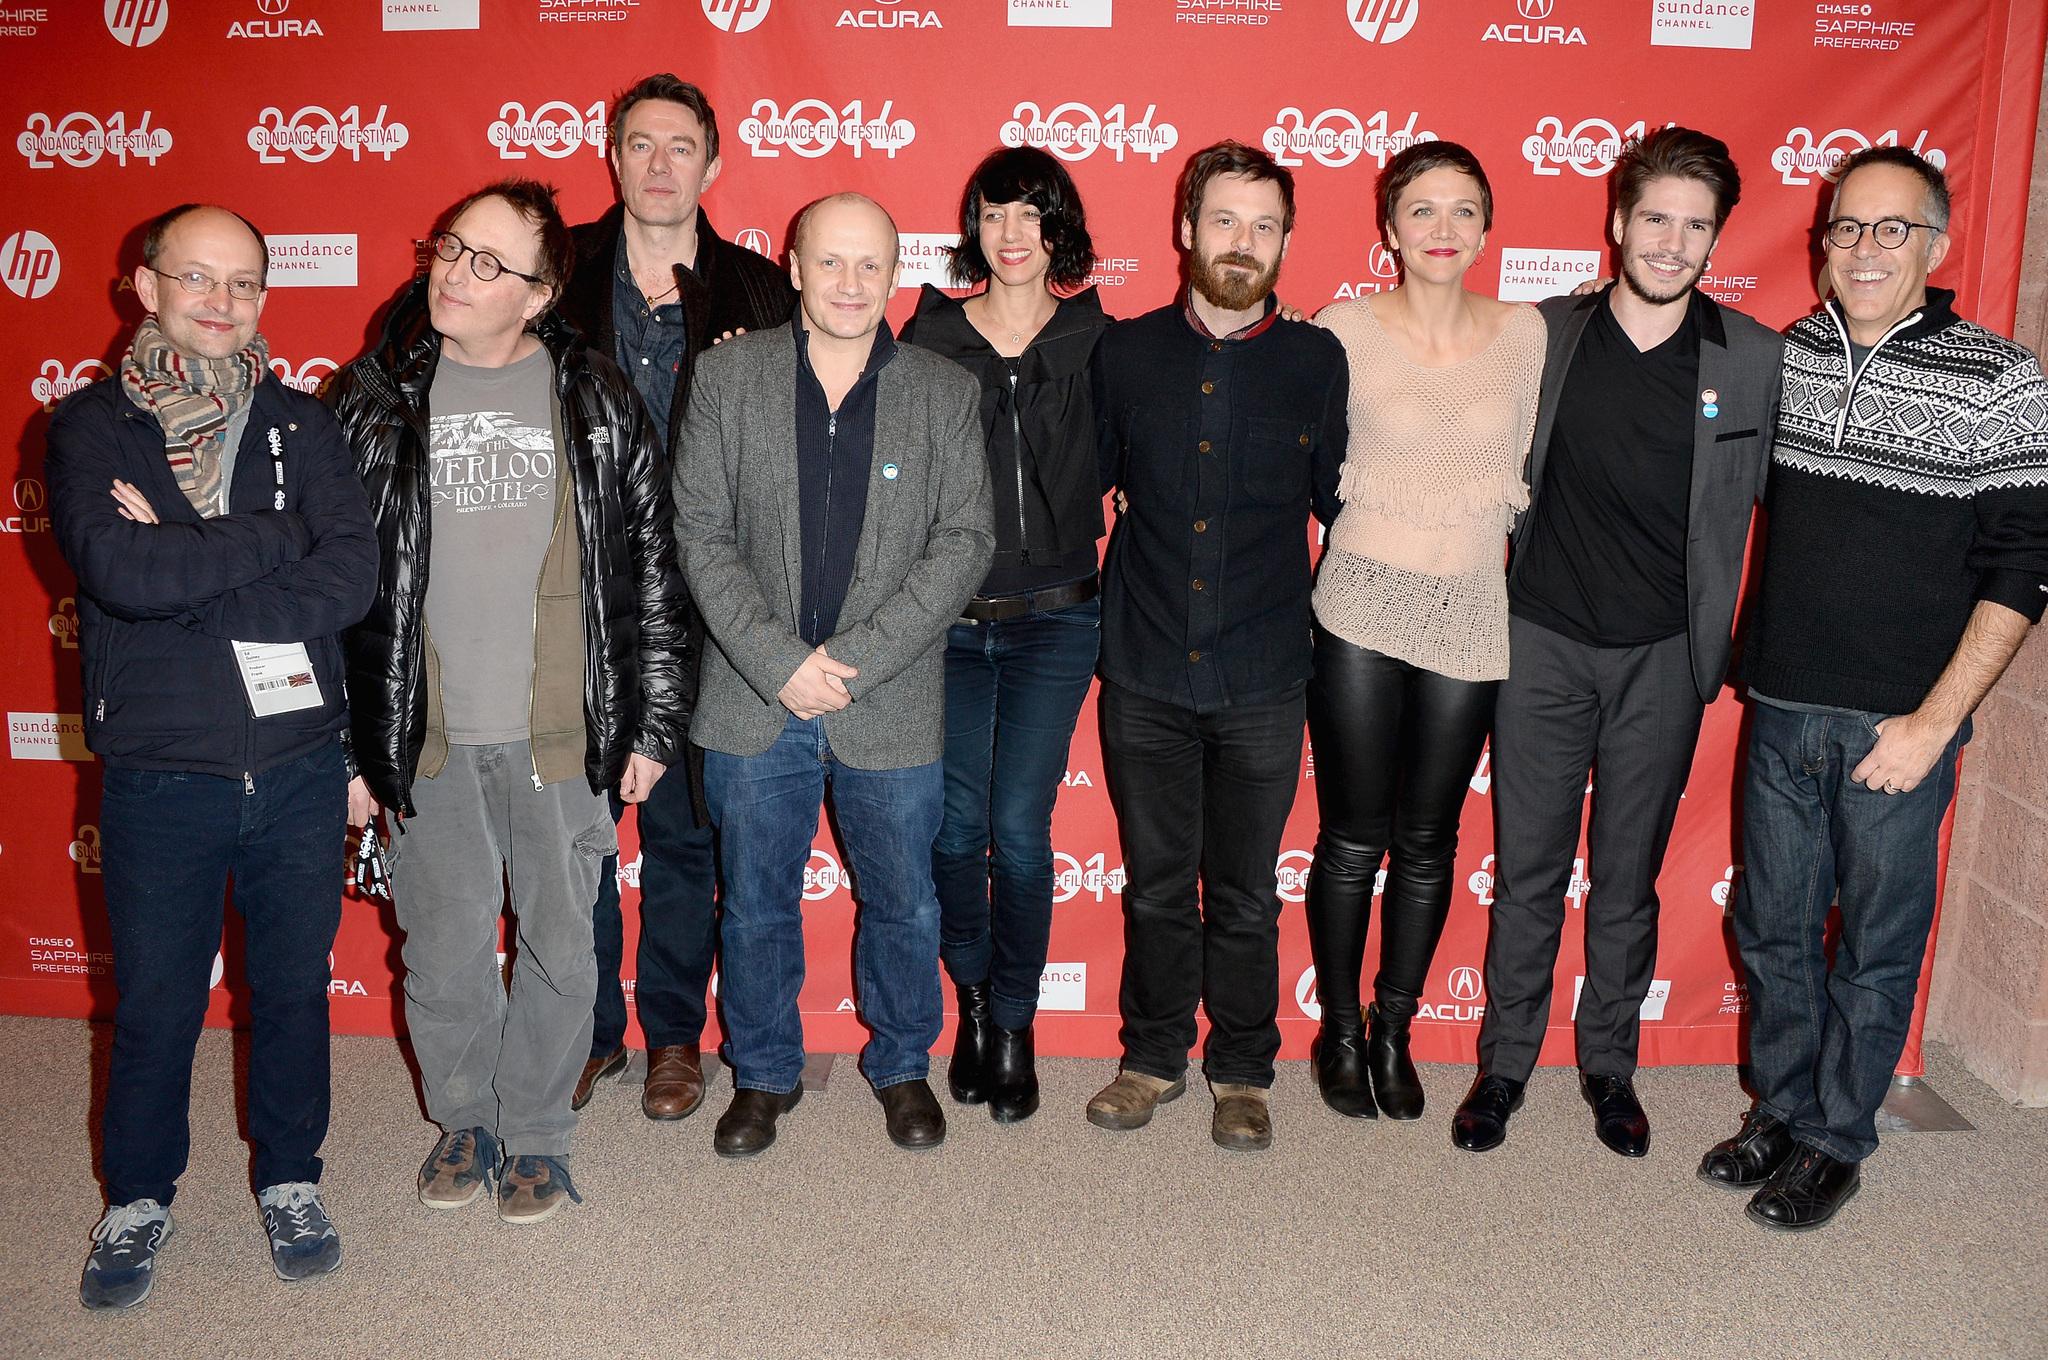 Ed Guiney, Maggie Gyllenhaal, Jon Ronson, Lenny Abrahamson, Scoot McNairy, Peter Straughan, John Cooper, François Civil, and Carla Azar at an event for Frank (2014)